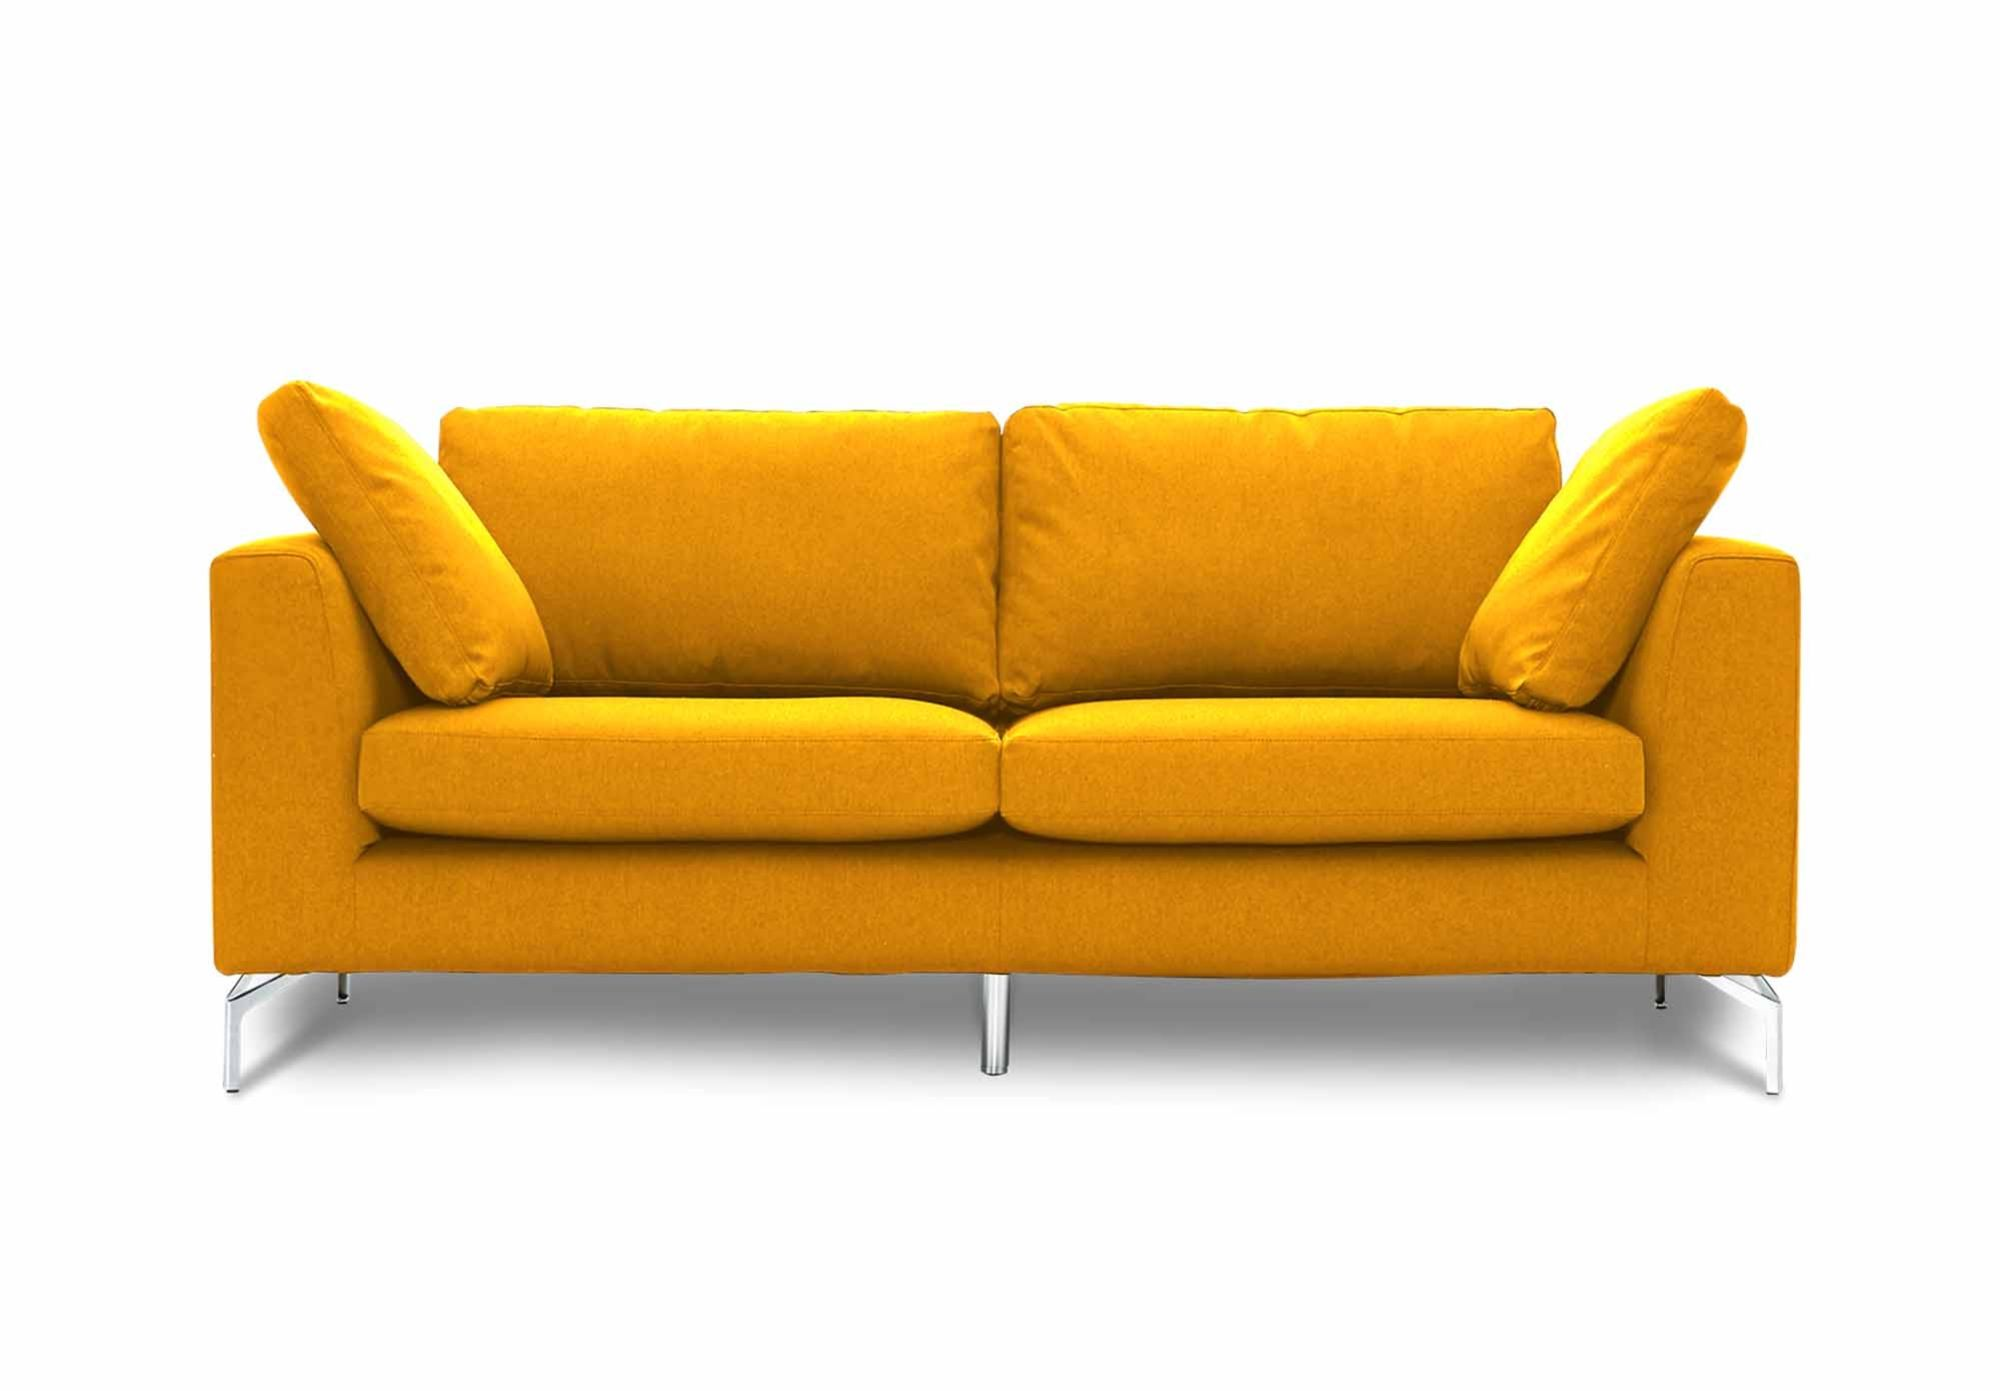 2 Seater Sofa Apex Living Room Furniture Sofas And Armchairs Furniture Village 799 Armchair Furniture Sofa 2 Seater Sofa